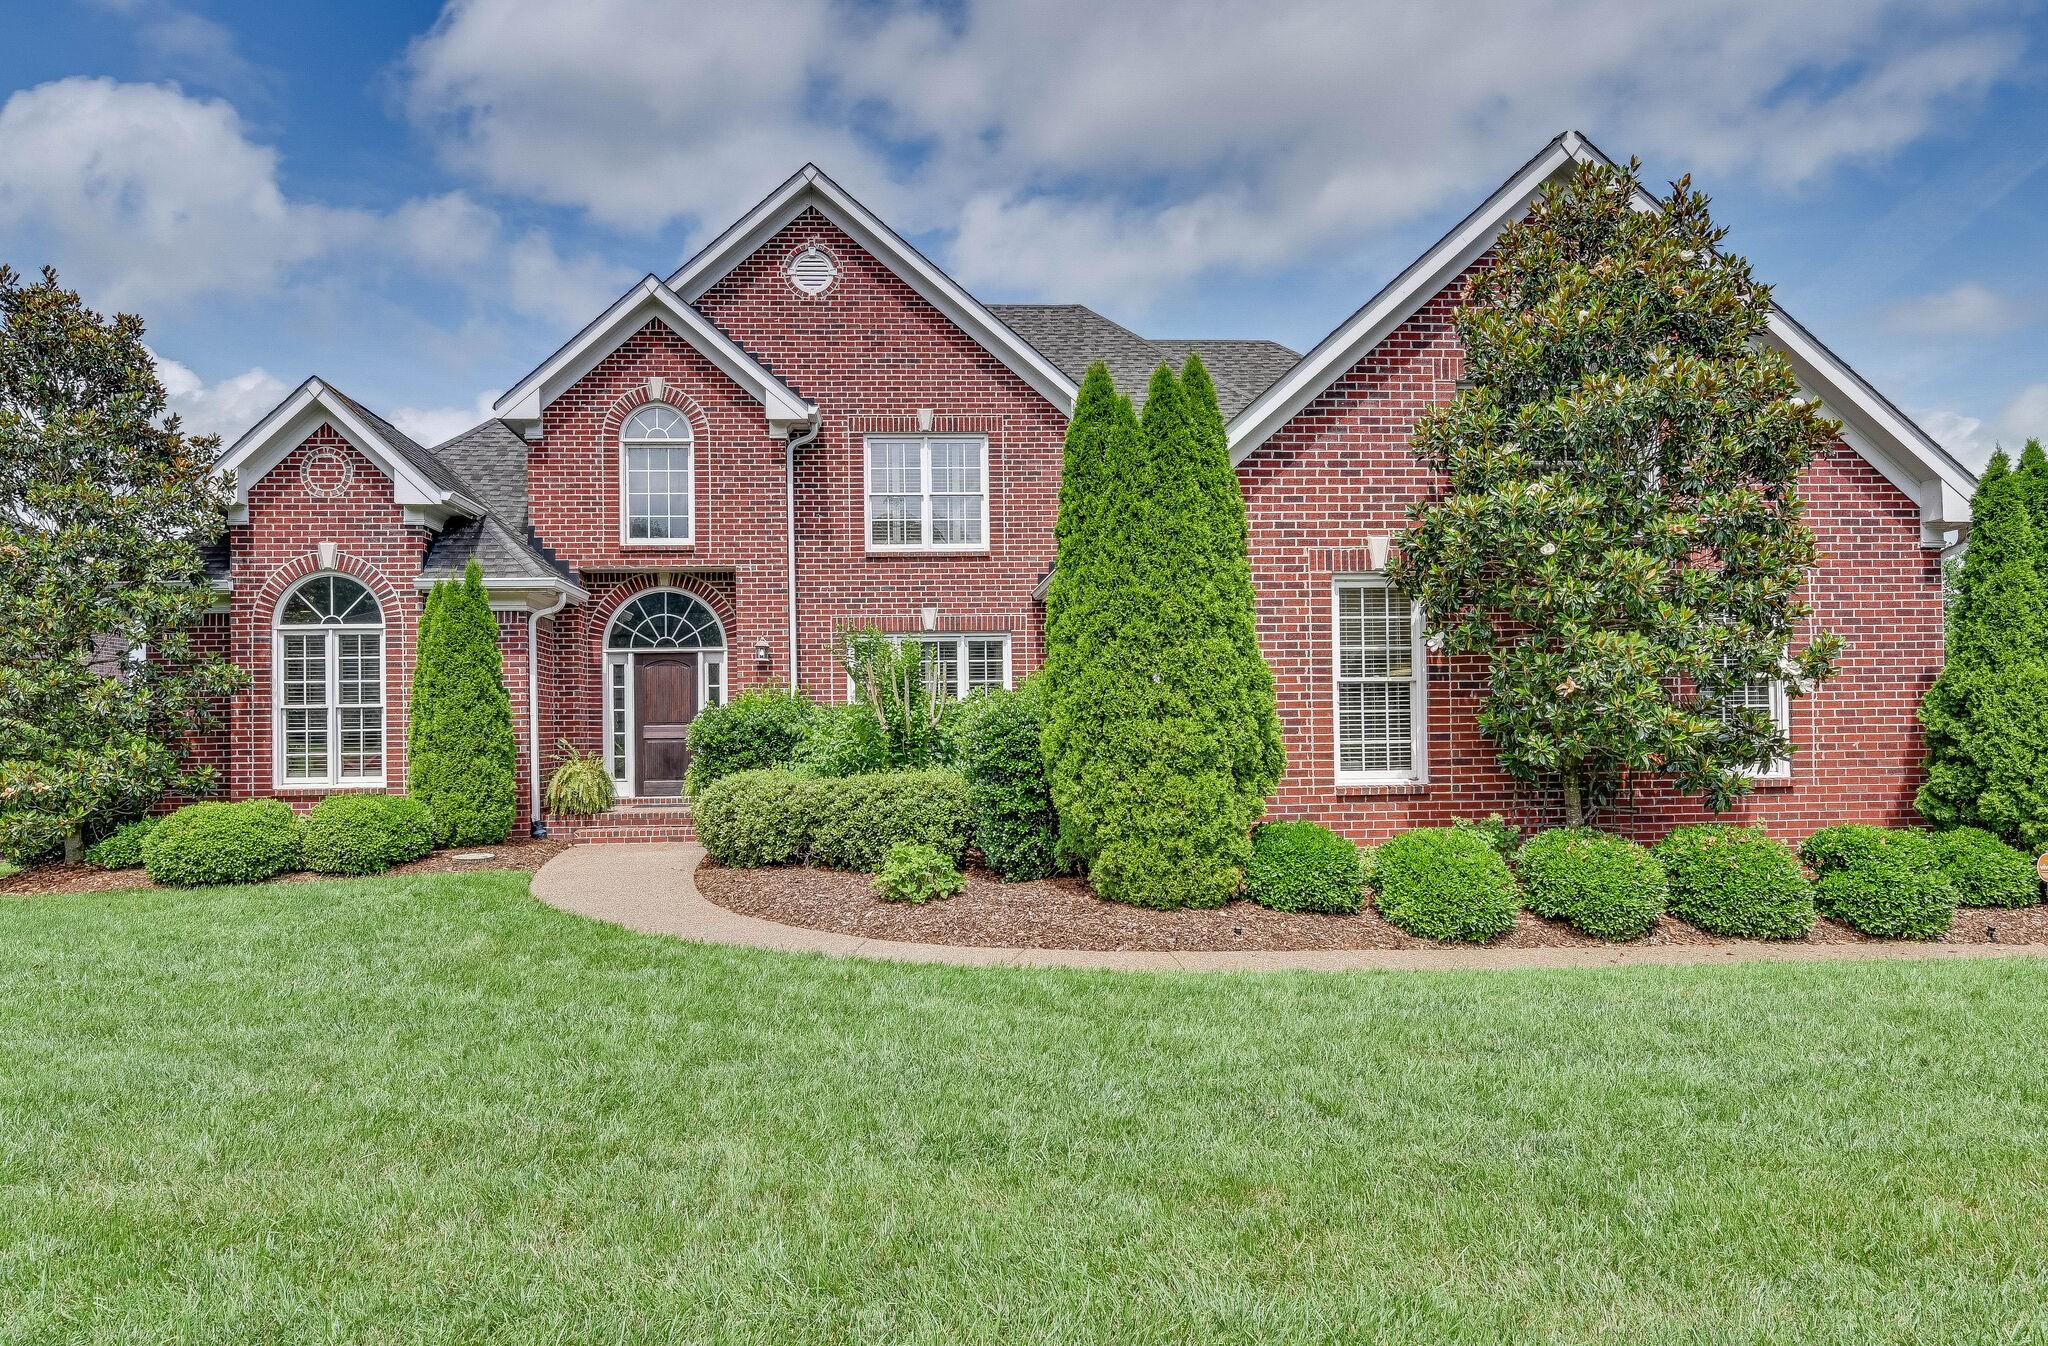 107 Gardengate Dr Property Photo - Franklin, TN real estate listing